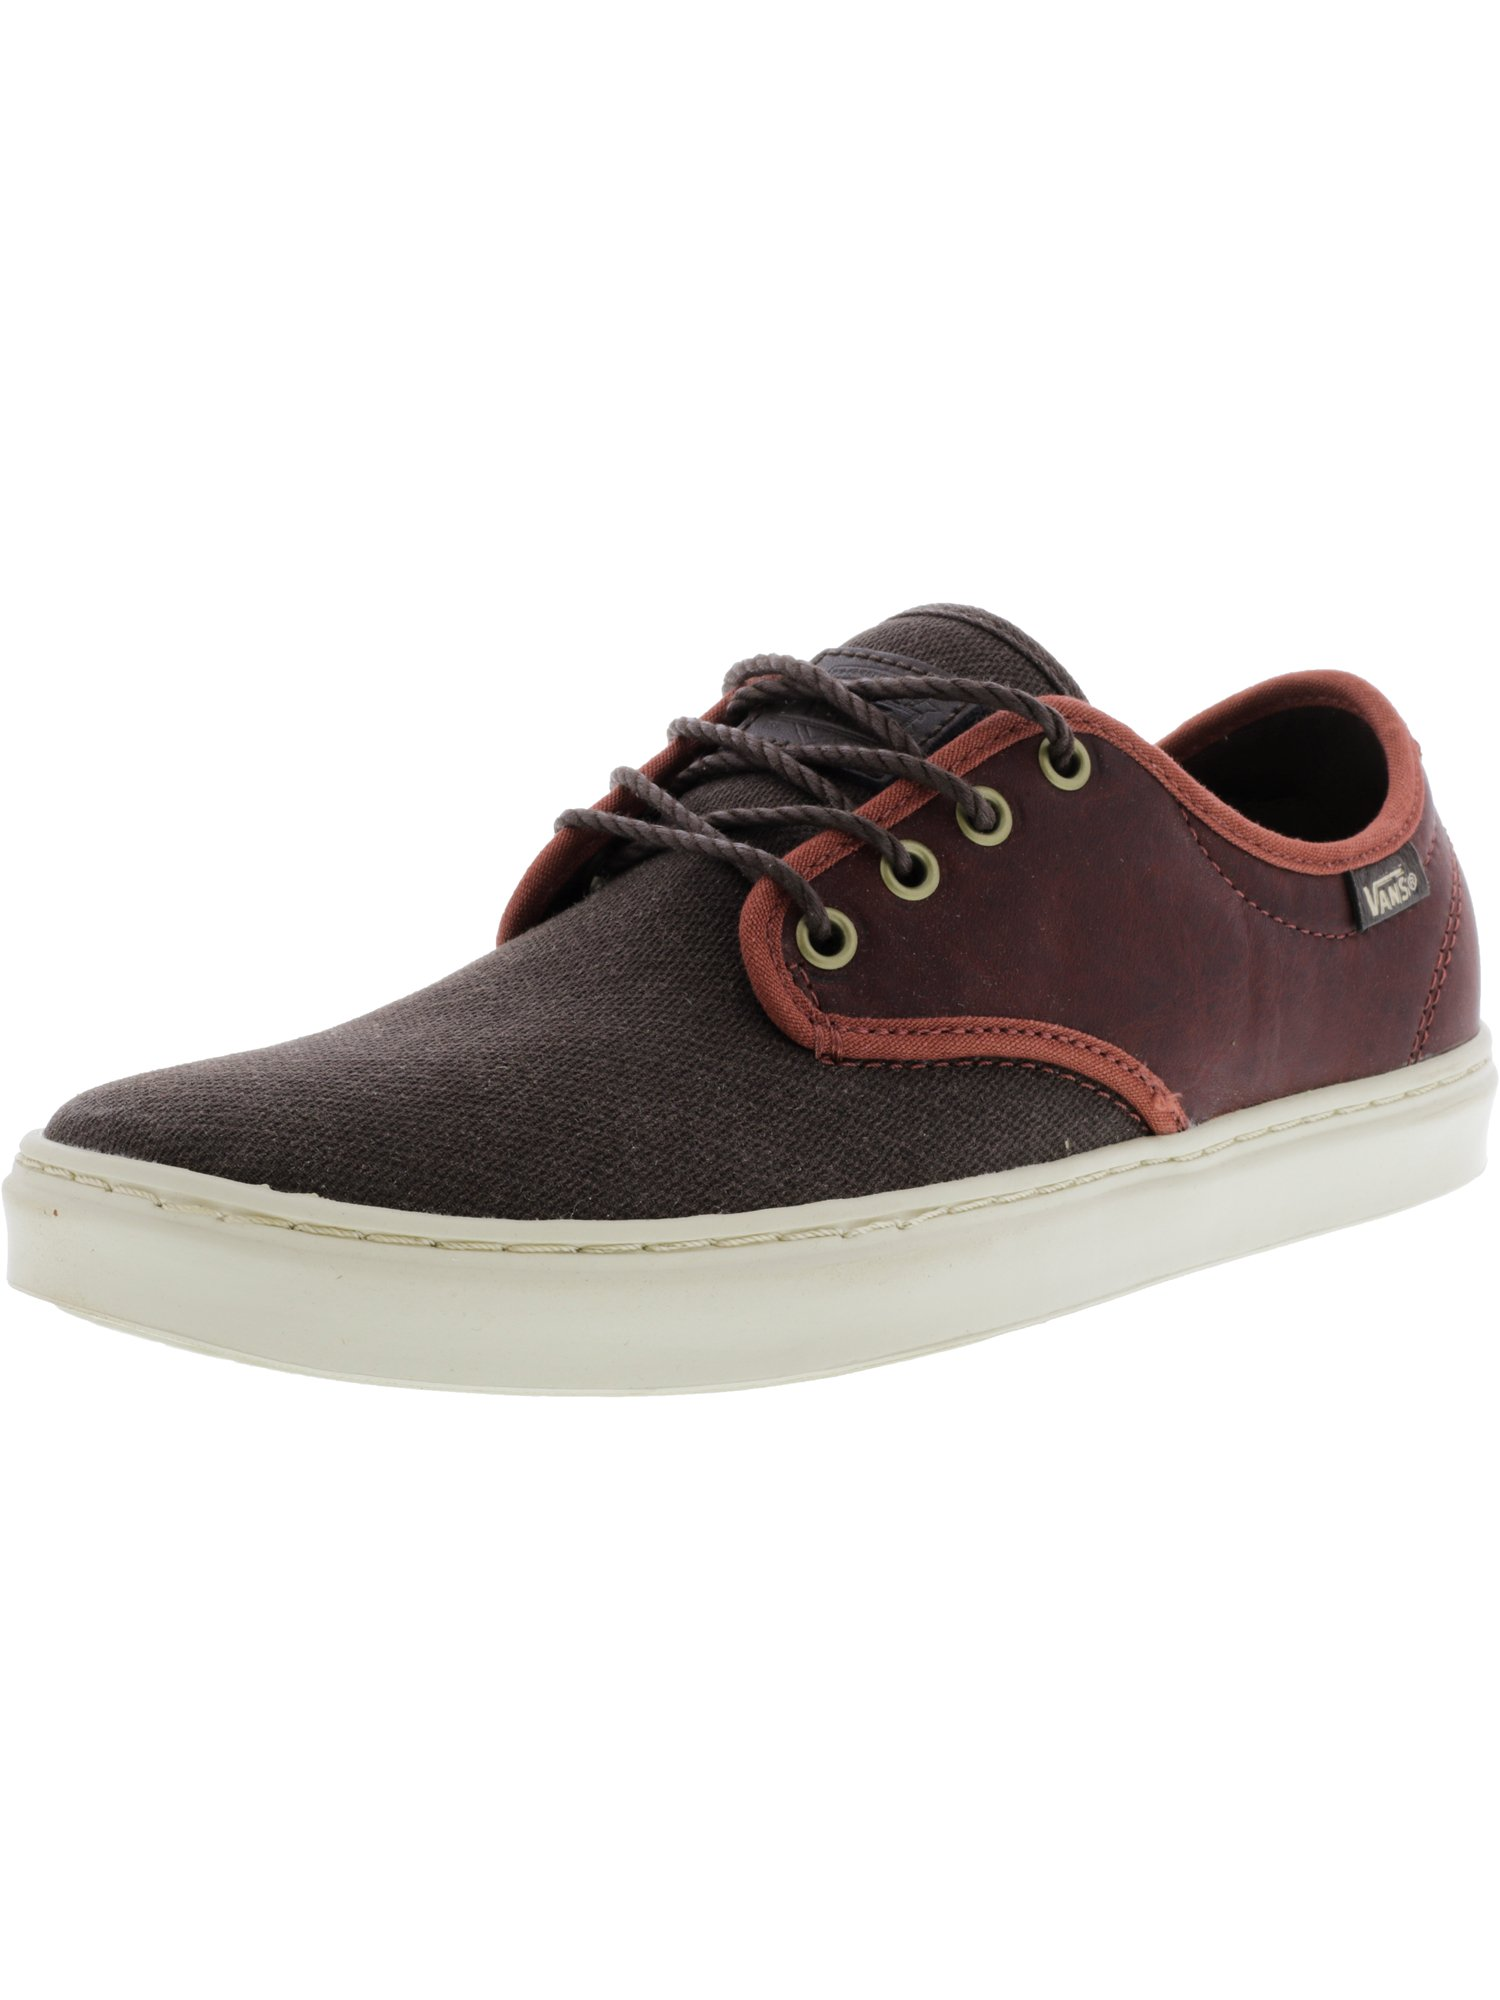 Vans Ludlow + Leather Henna Ankle-High Skateboarding Shoe - 8M / 6.5M